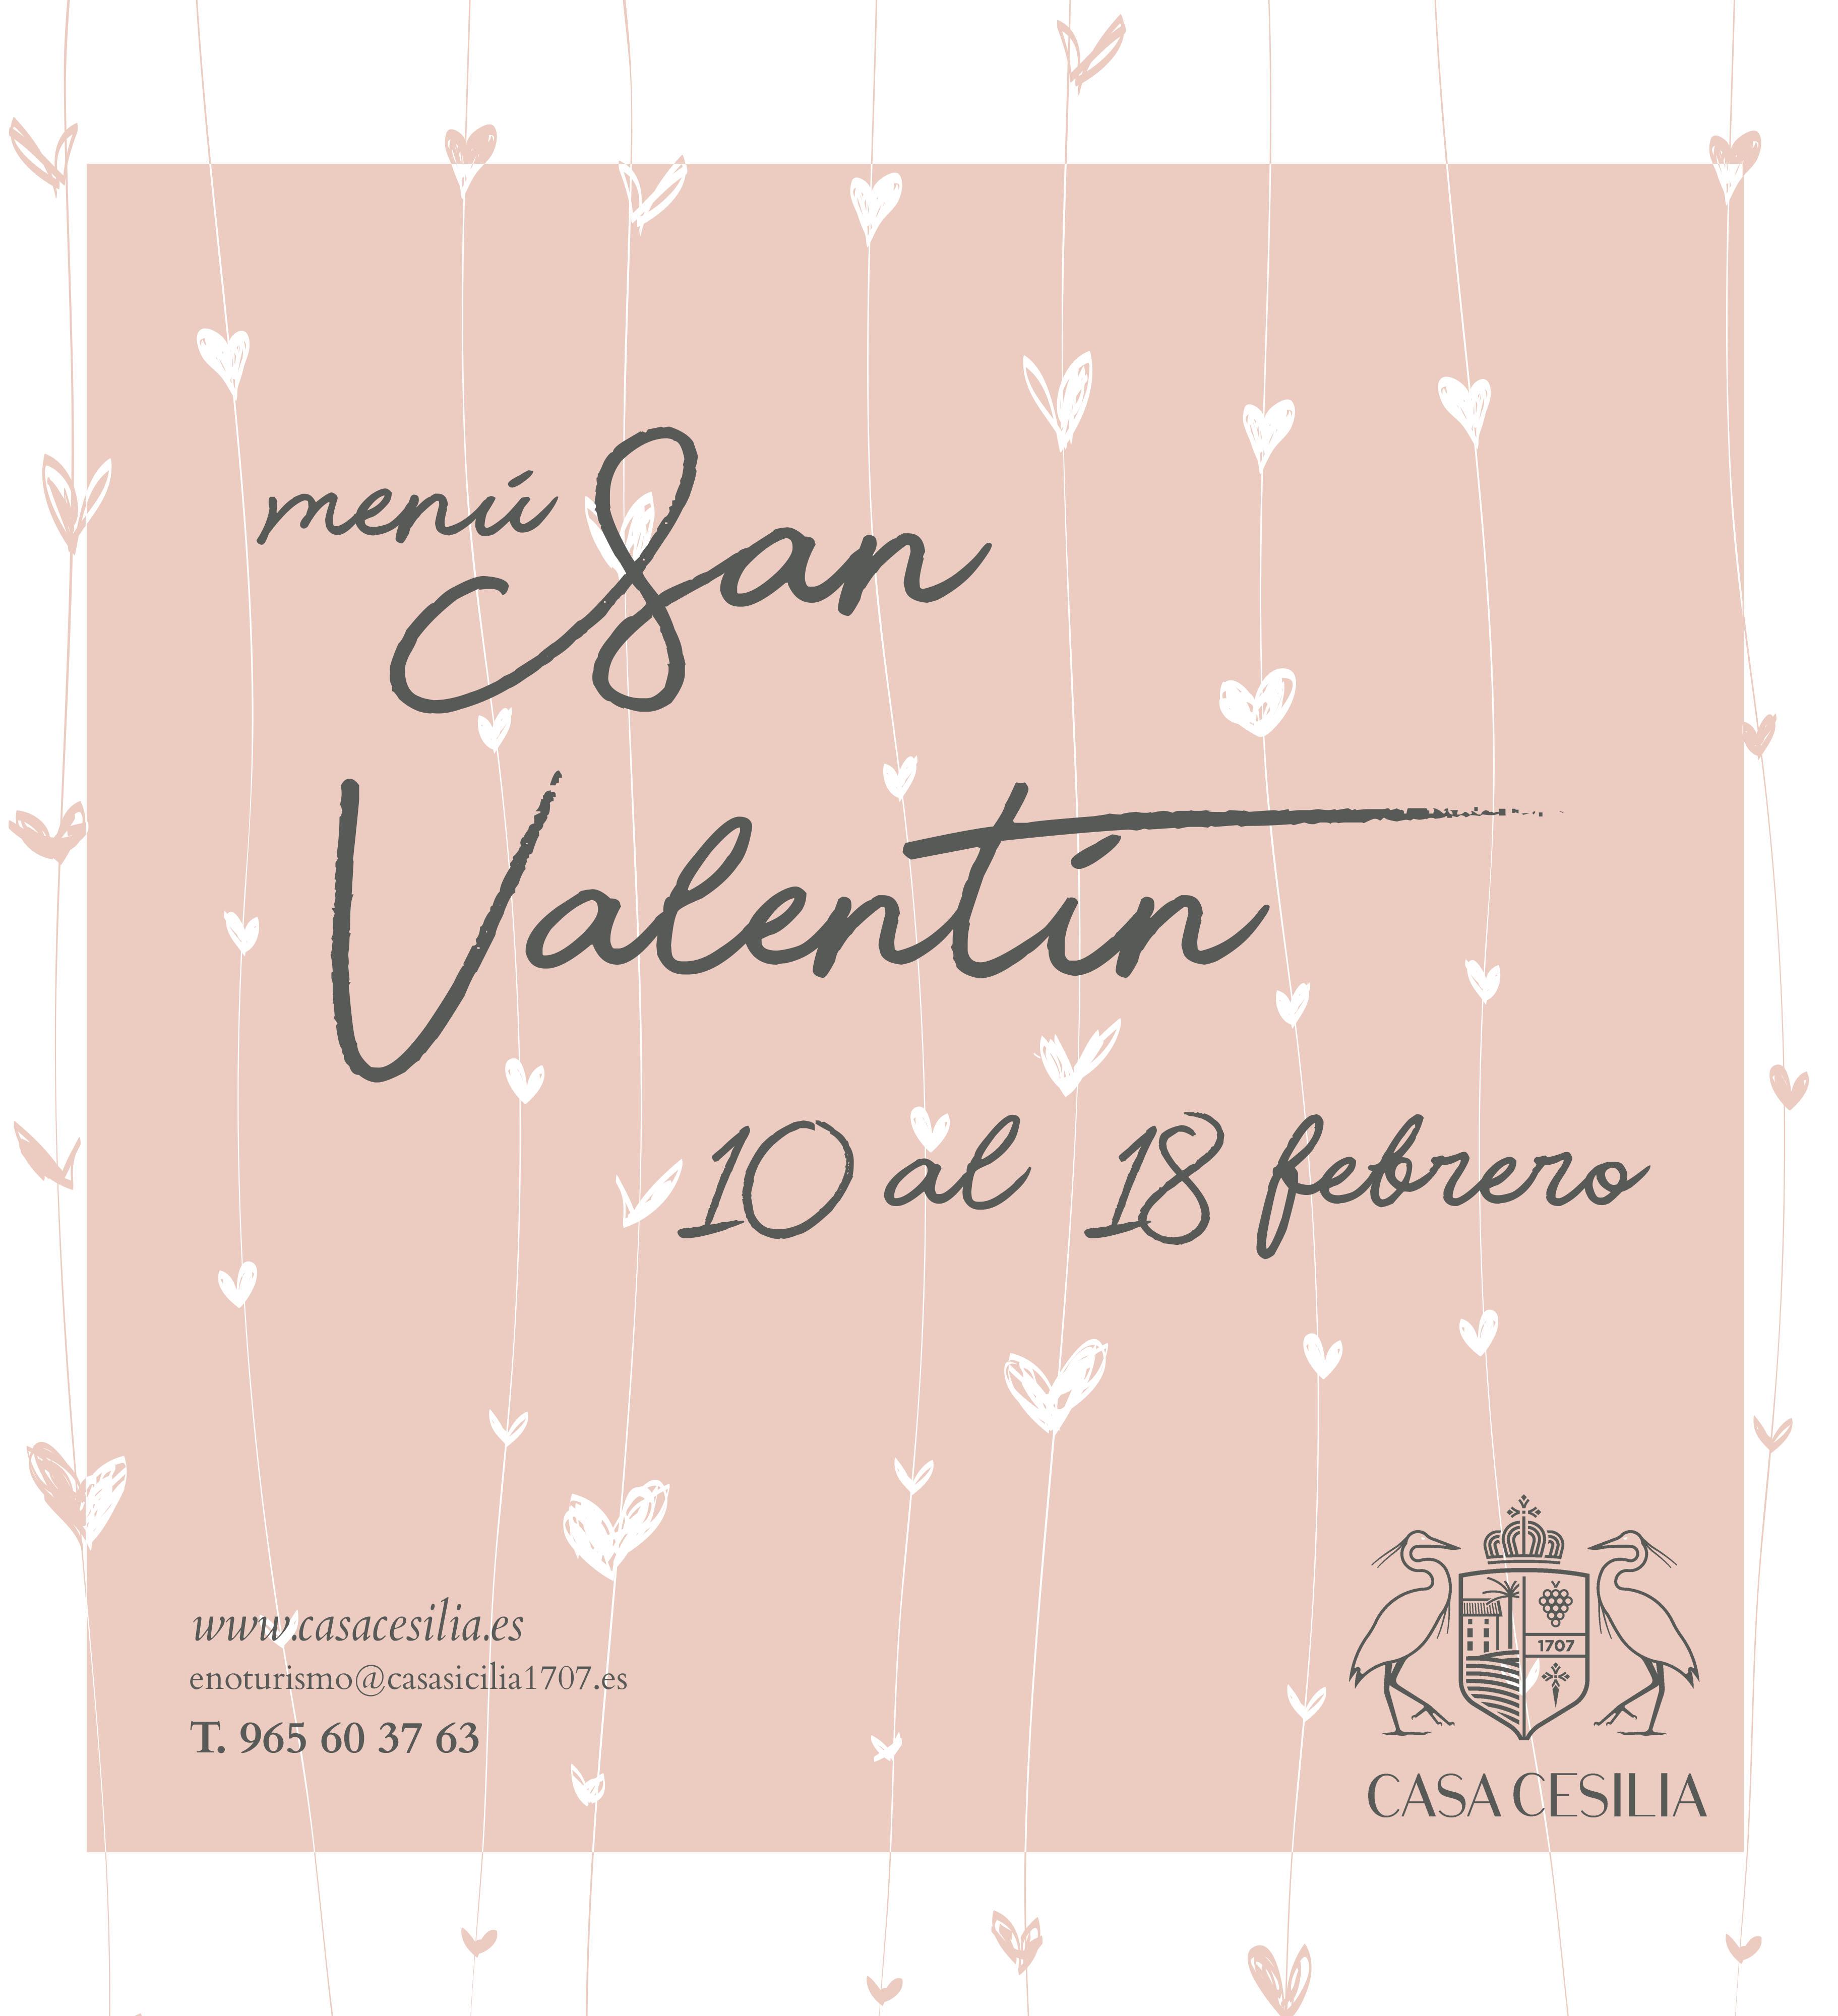 Menu especial Casa Cesilia San Valentín